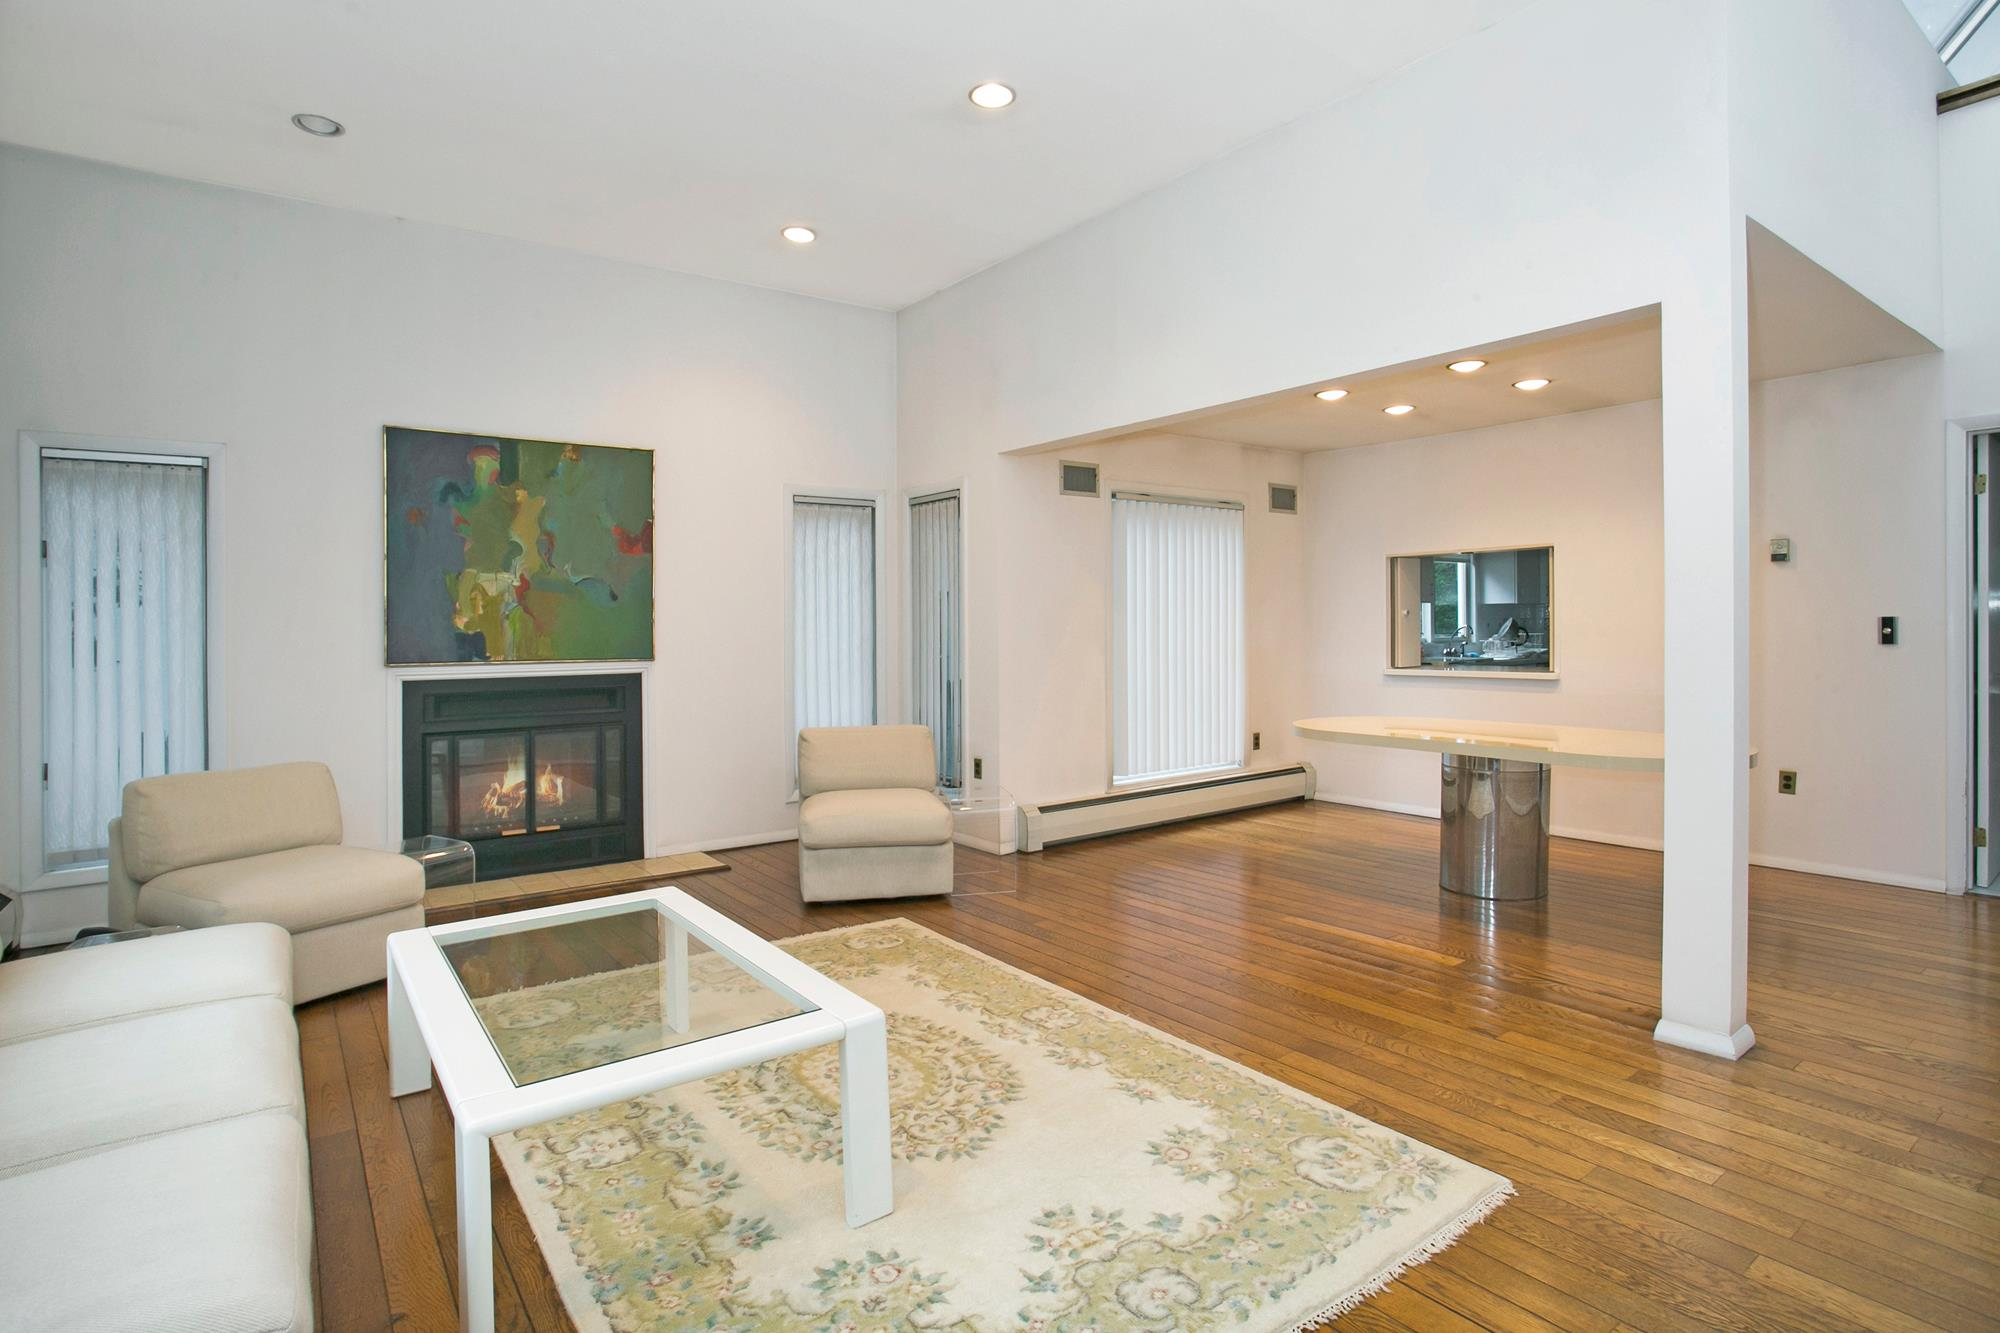 FIELDSTON: Stylish & Bright 4-Bd. Solar House with Patio & Garden